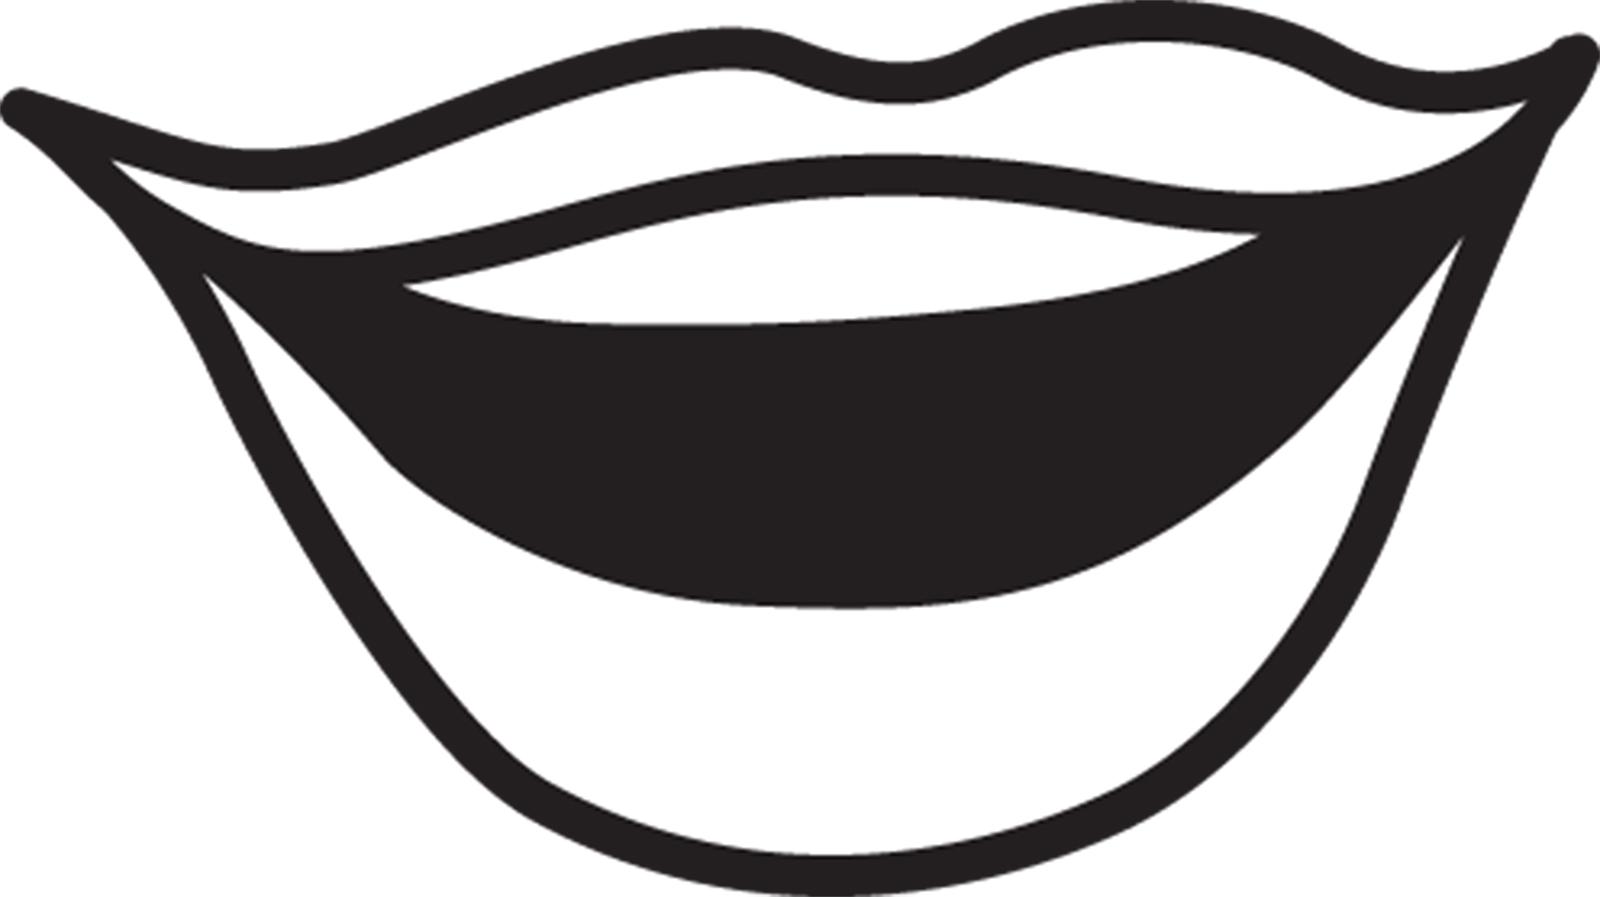 1600x897 Quiet Mouth Clip Art Free Clipart Images